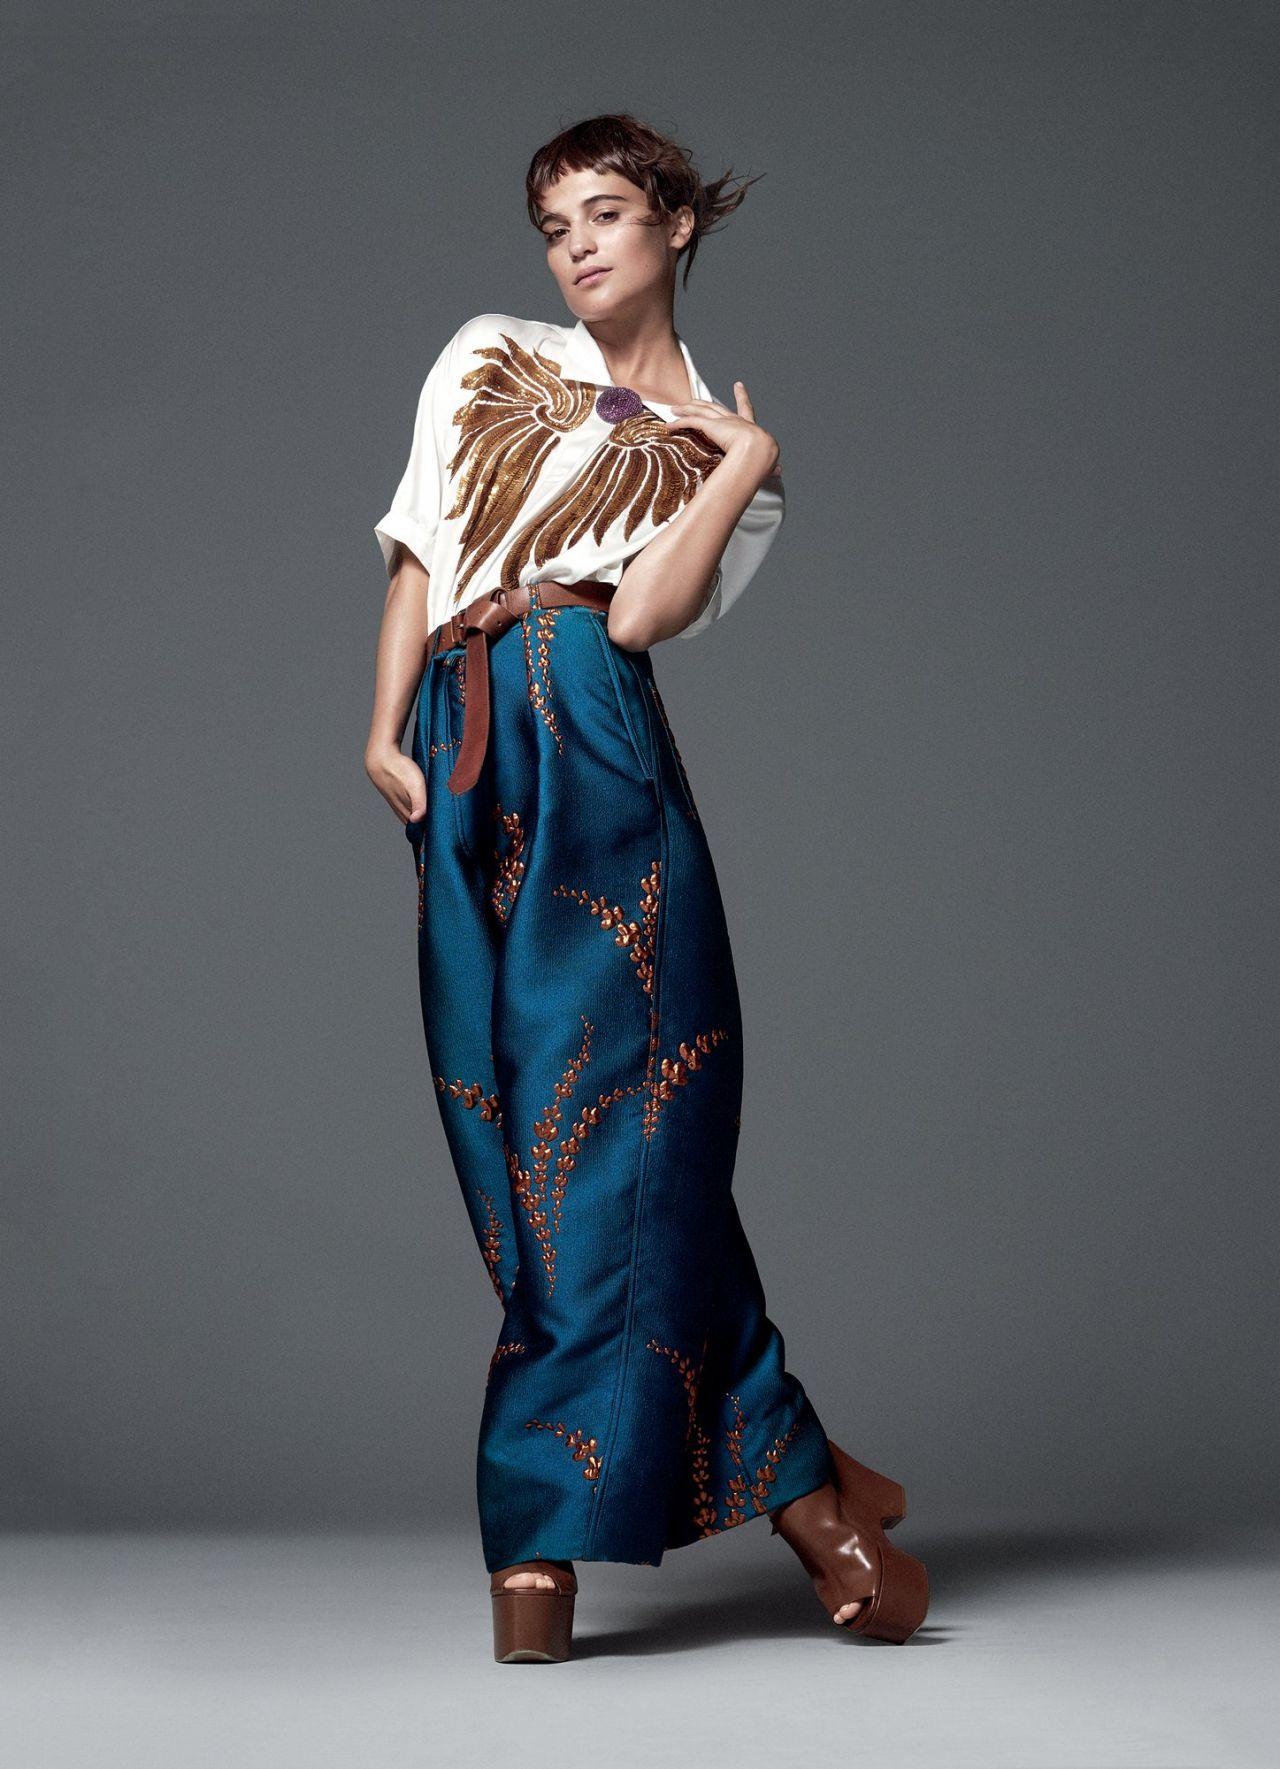 Alicia Vikander Vogue Magazine Us January 2016 Cover And